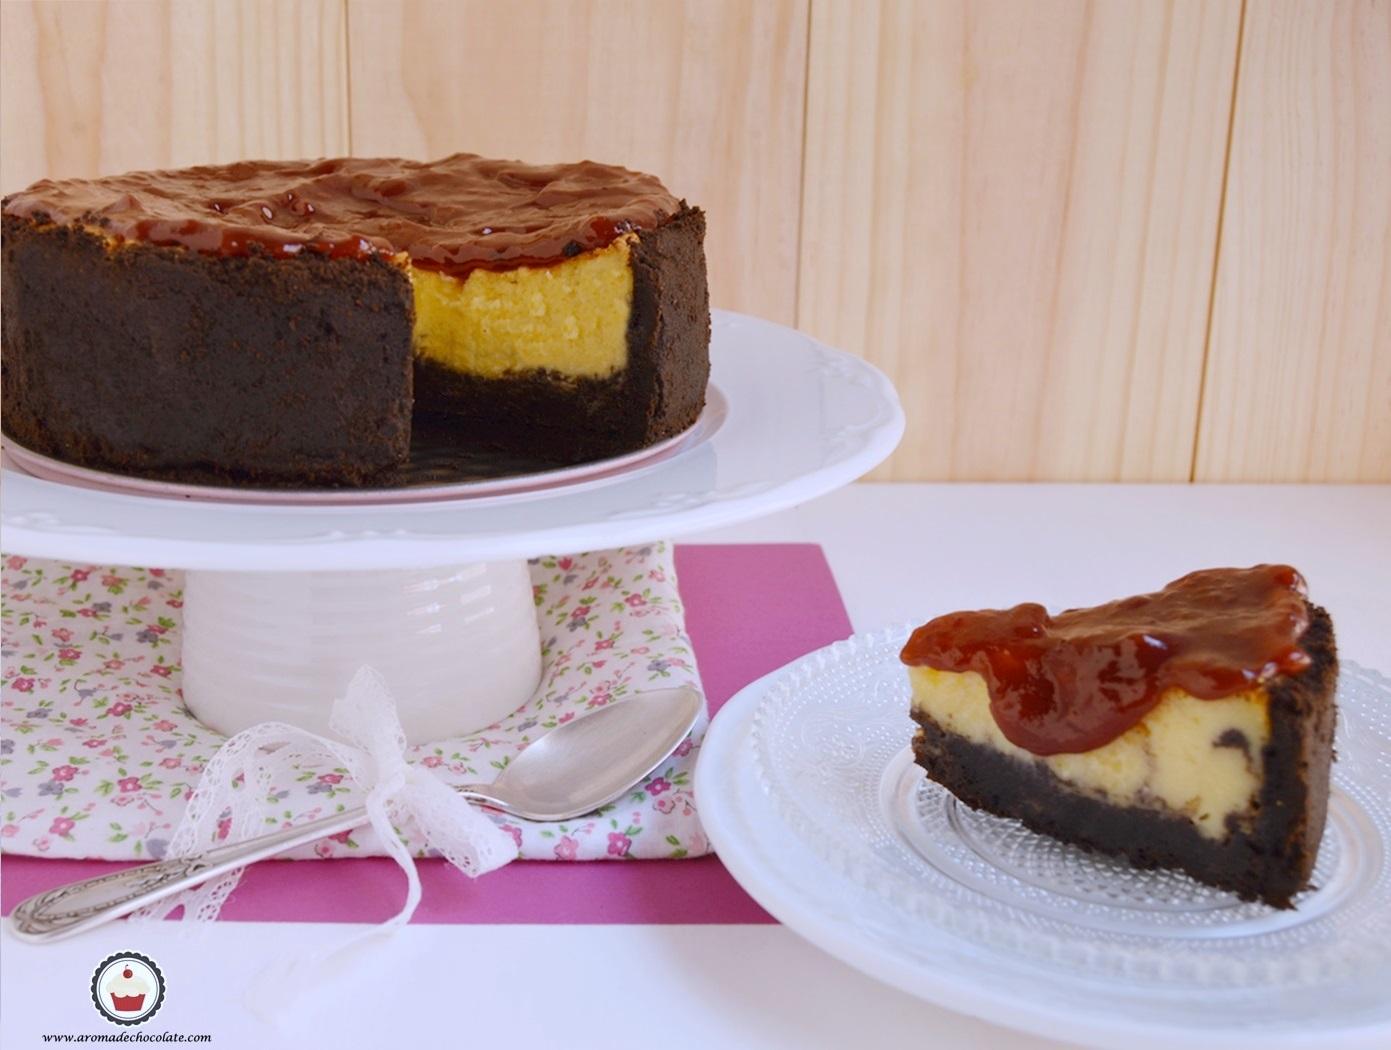 Cheesecake de naranja con cobertura de frambuesa. Aroma de chocolate